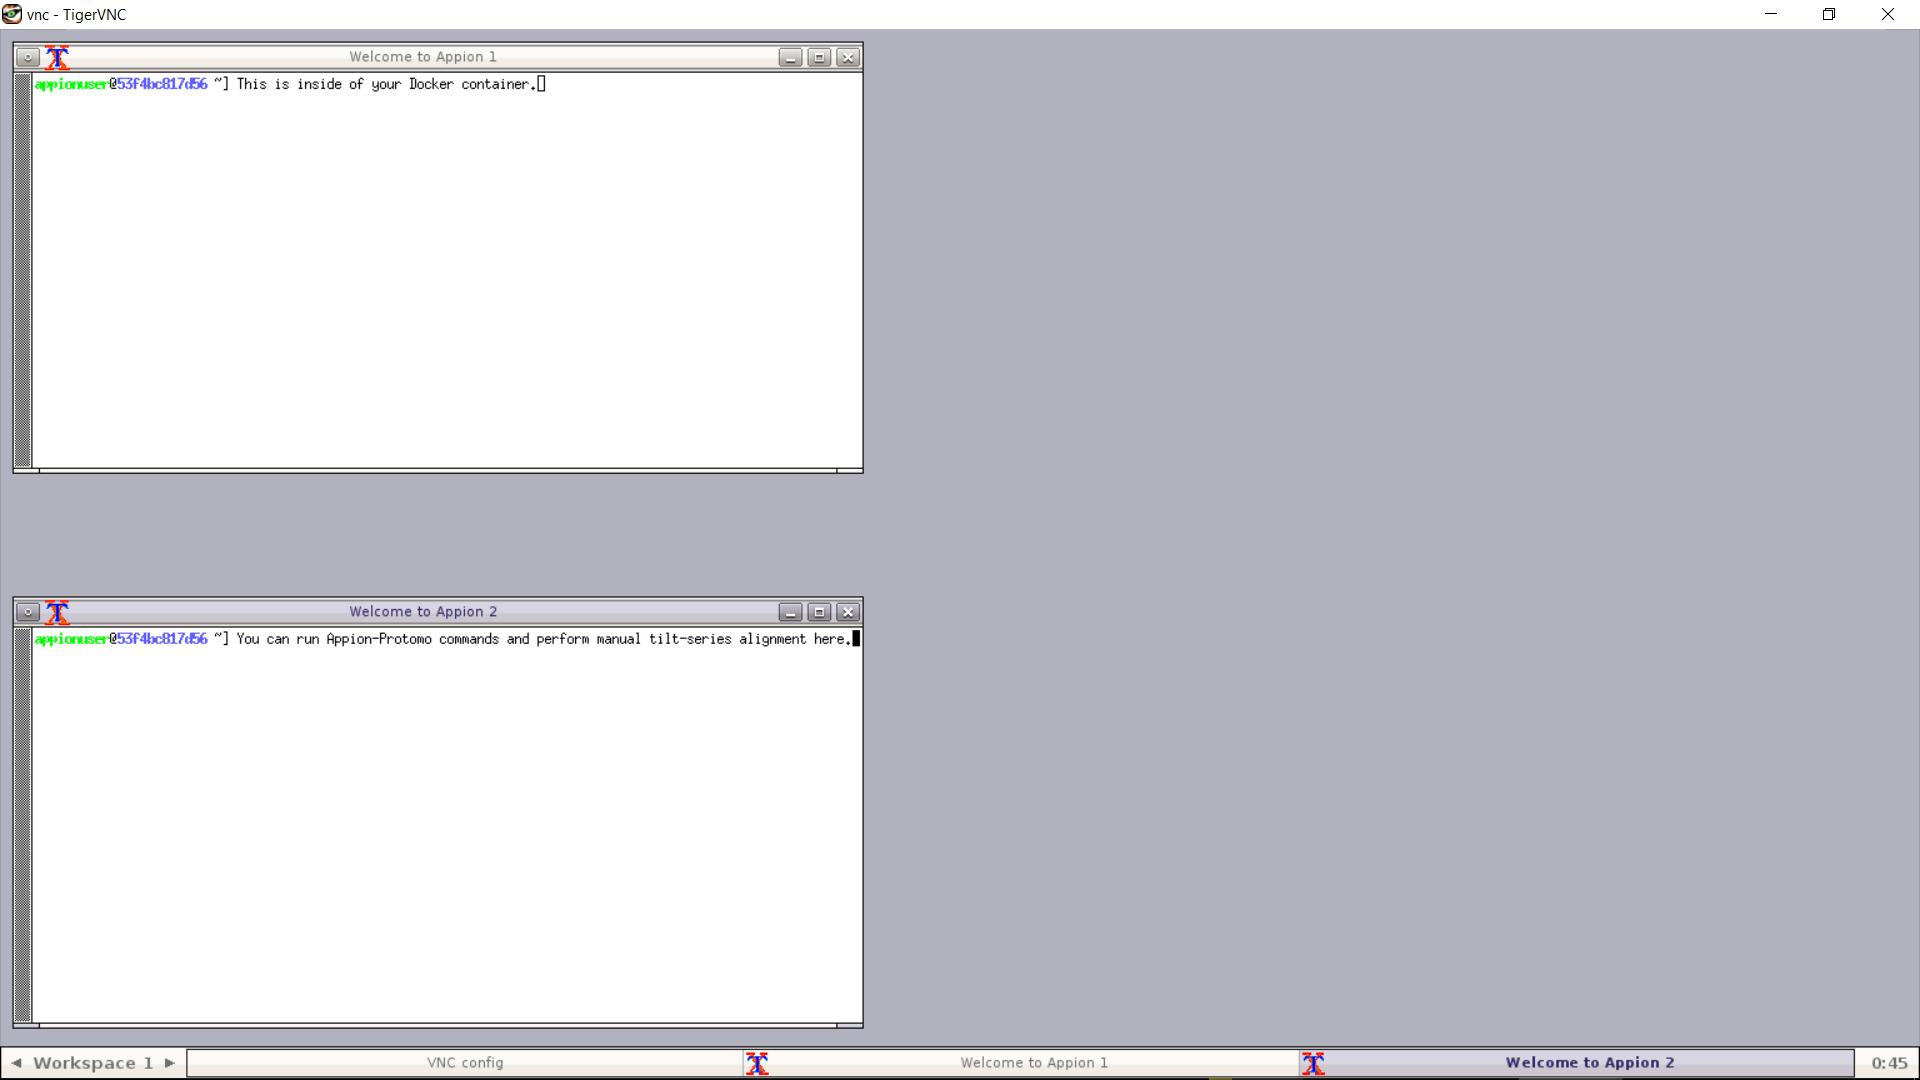 GitHub - nysbc/leginon-tutorial: Docker image for leginon with